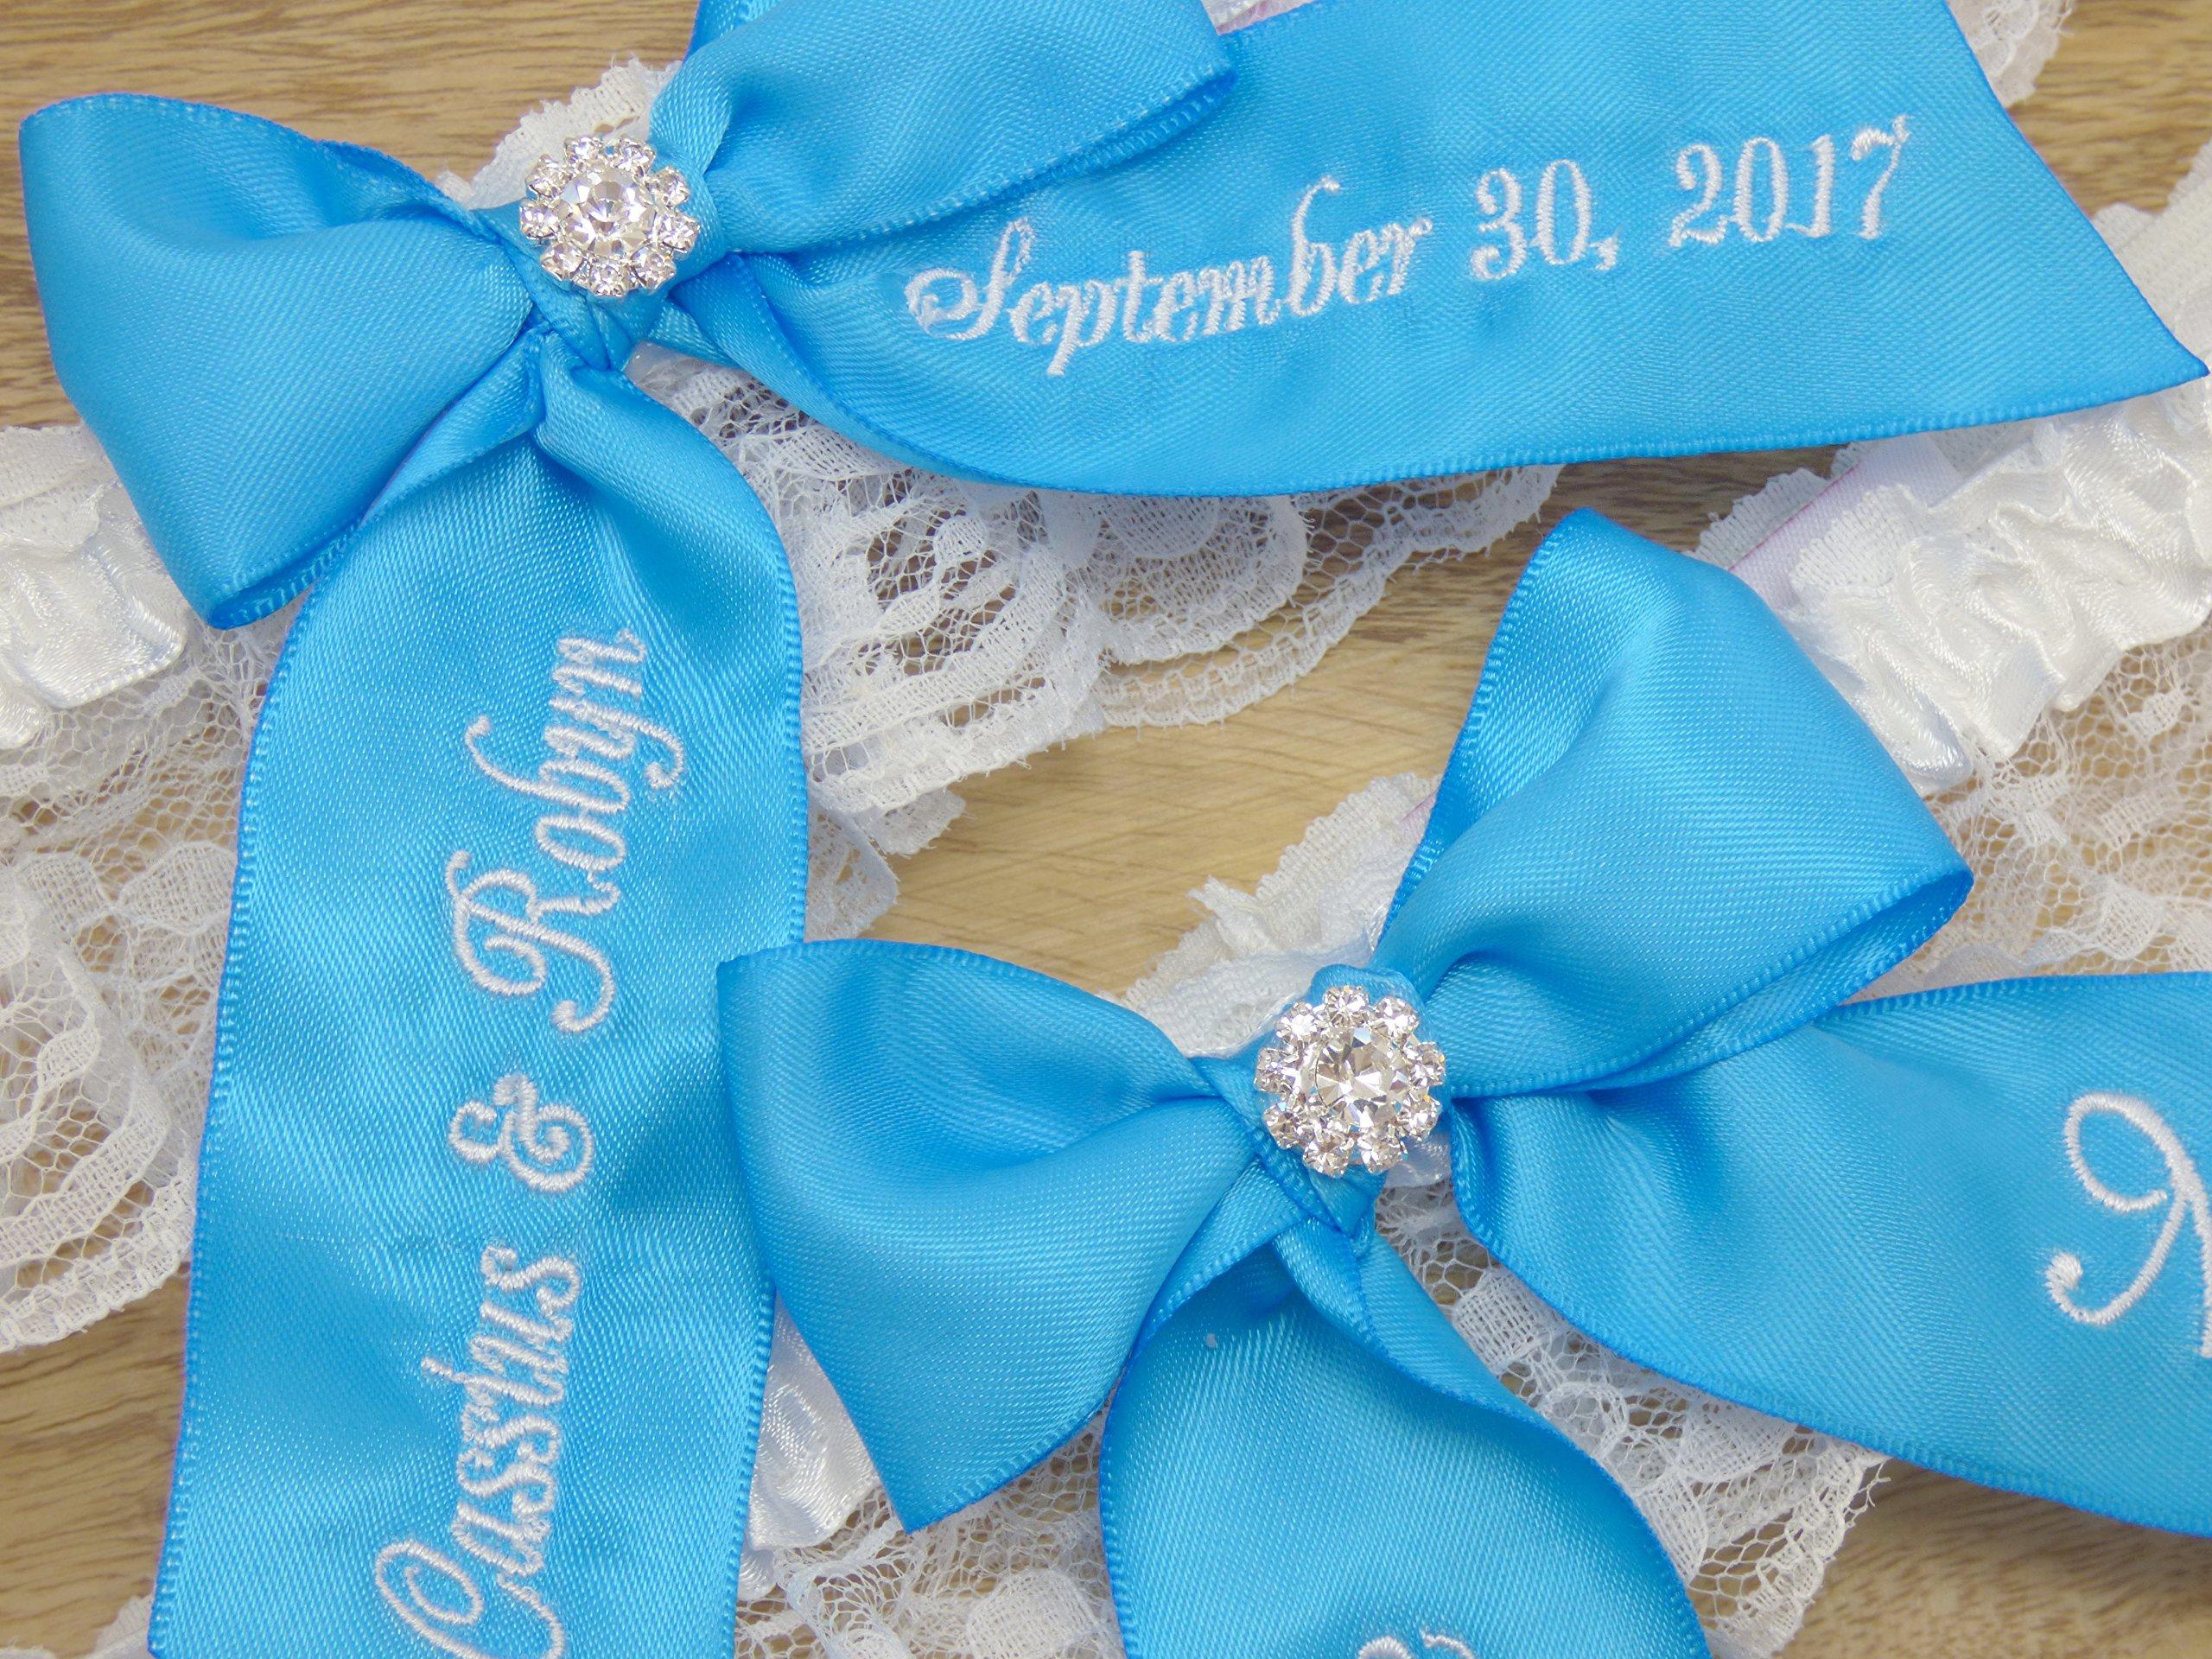 Blue Jewel Bridal Garter, You're Next Wedding Garter Set, Custom Garters, Something Blue